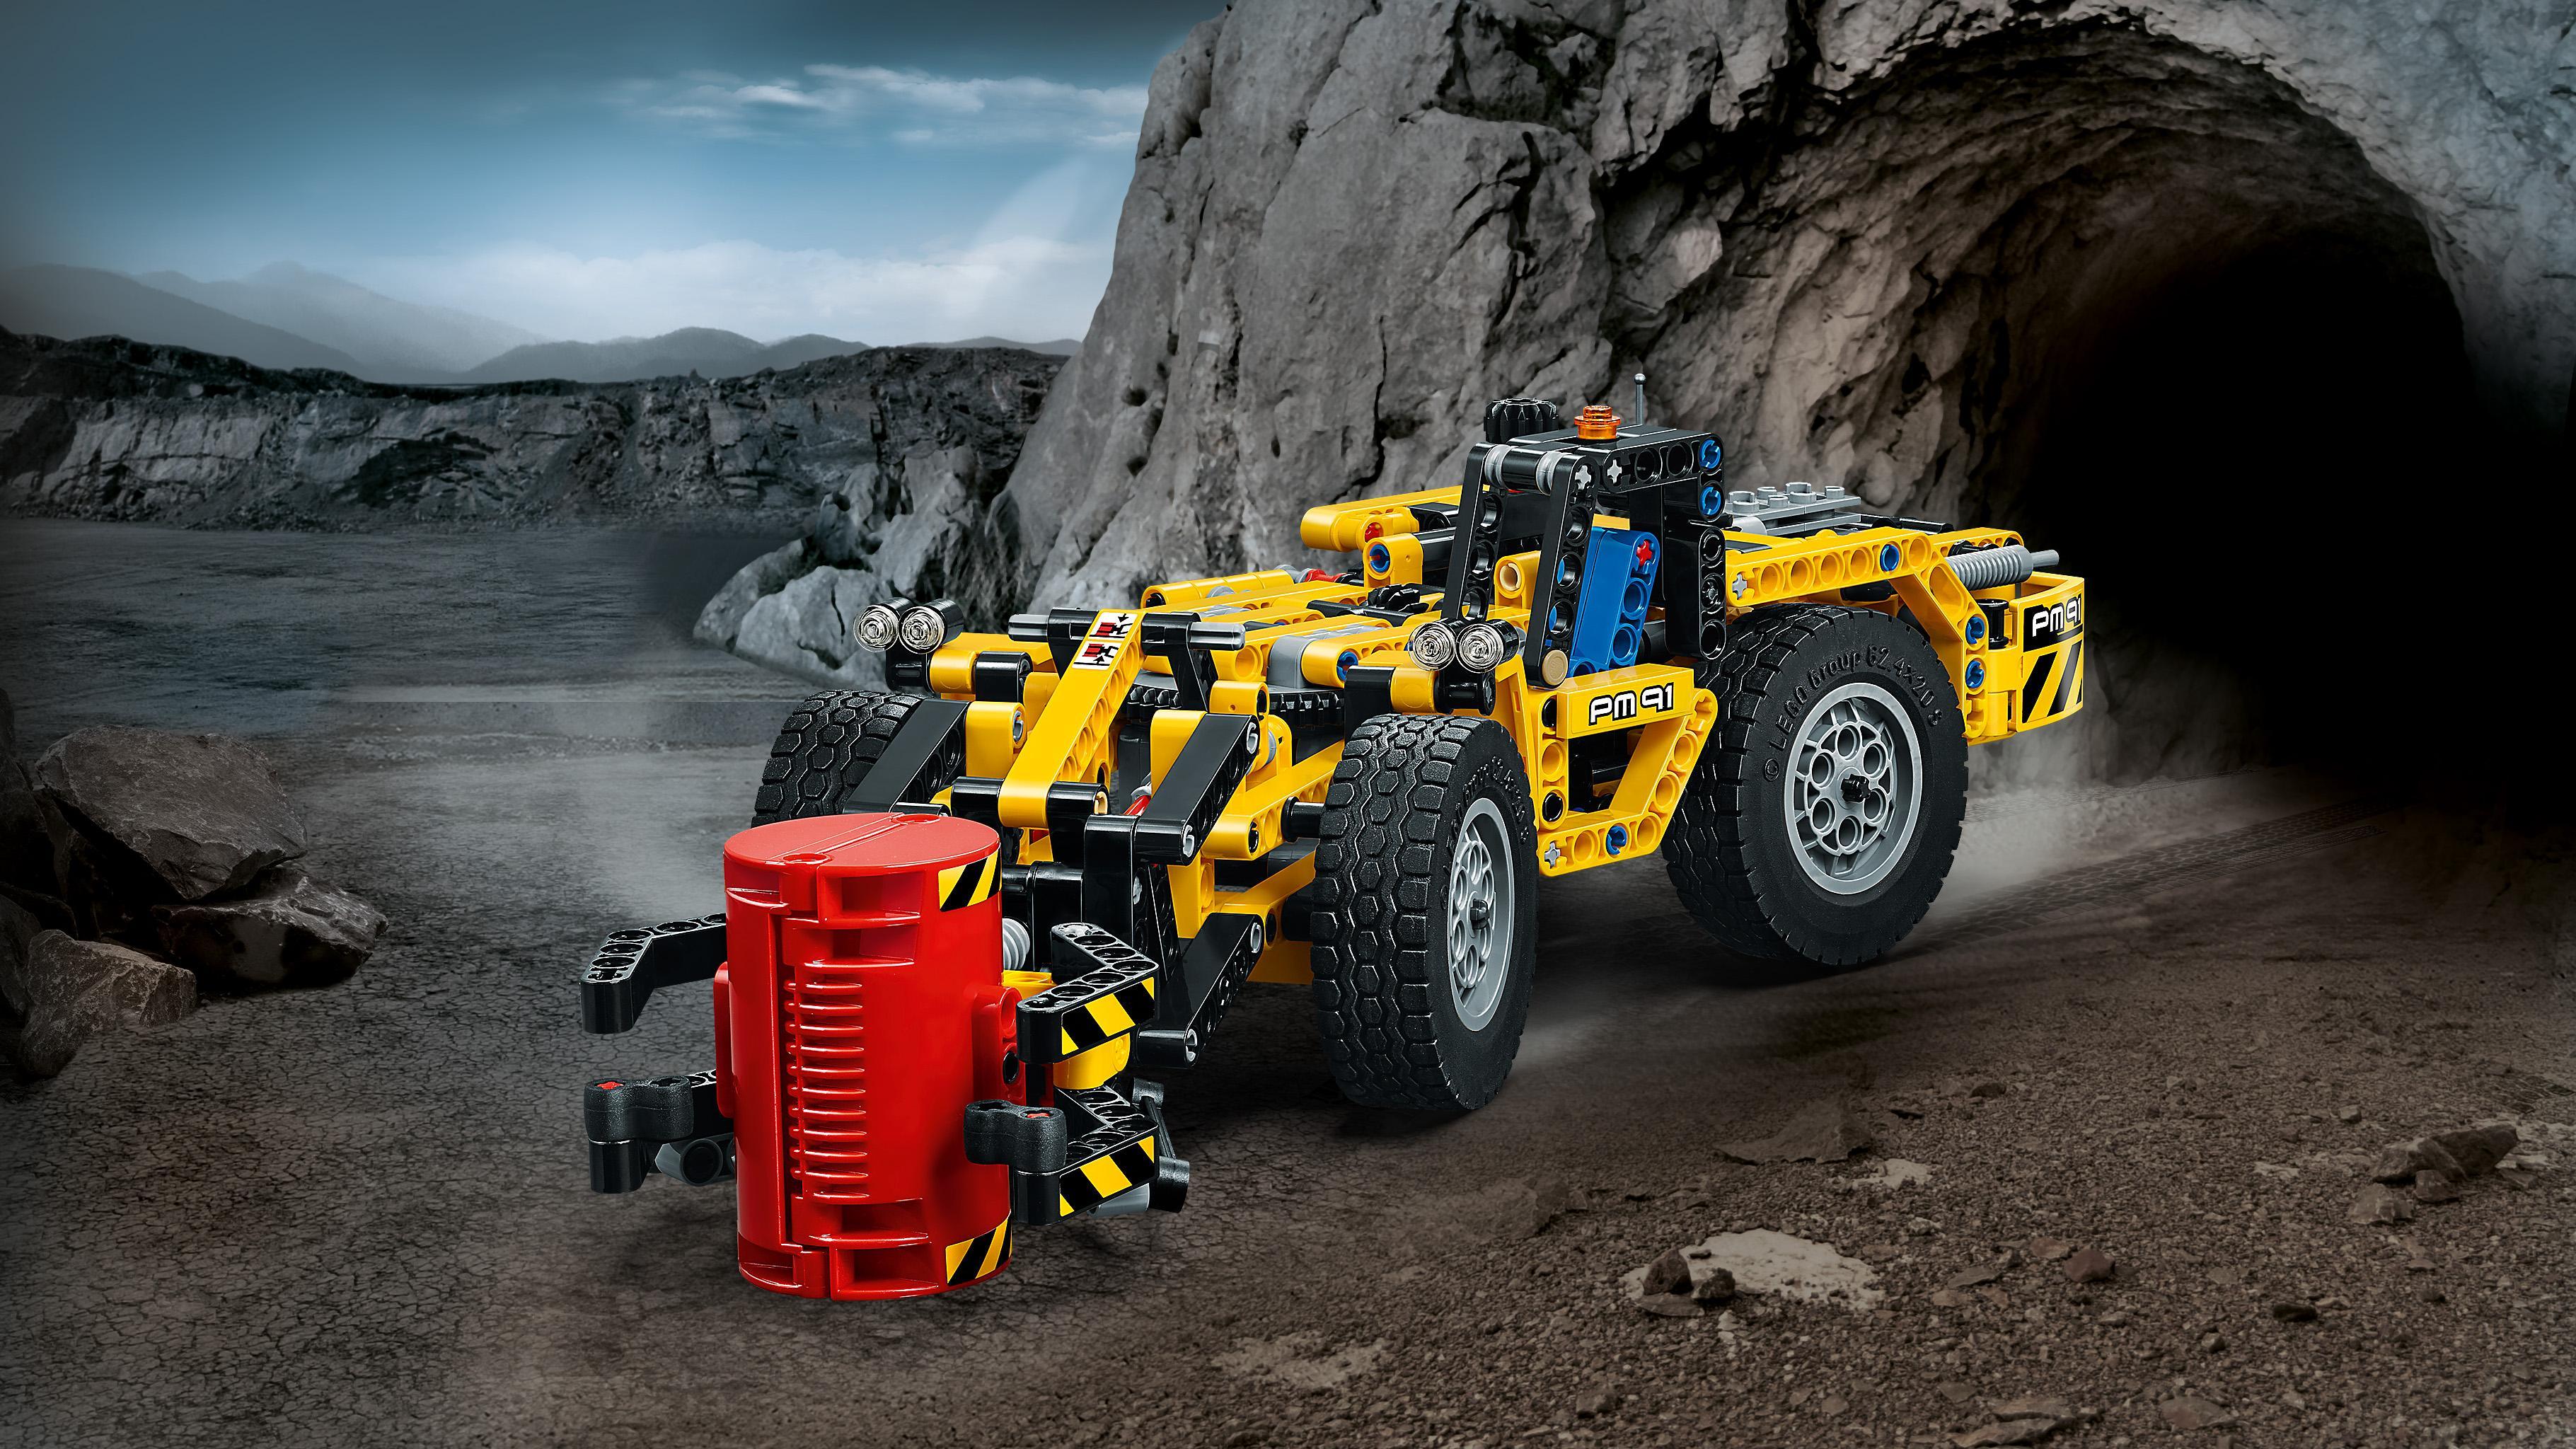 lego technic mine loader 42049 vehicle toy toys games. Black Bedroom Furniture Sets. Home Design Ideas